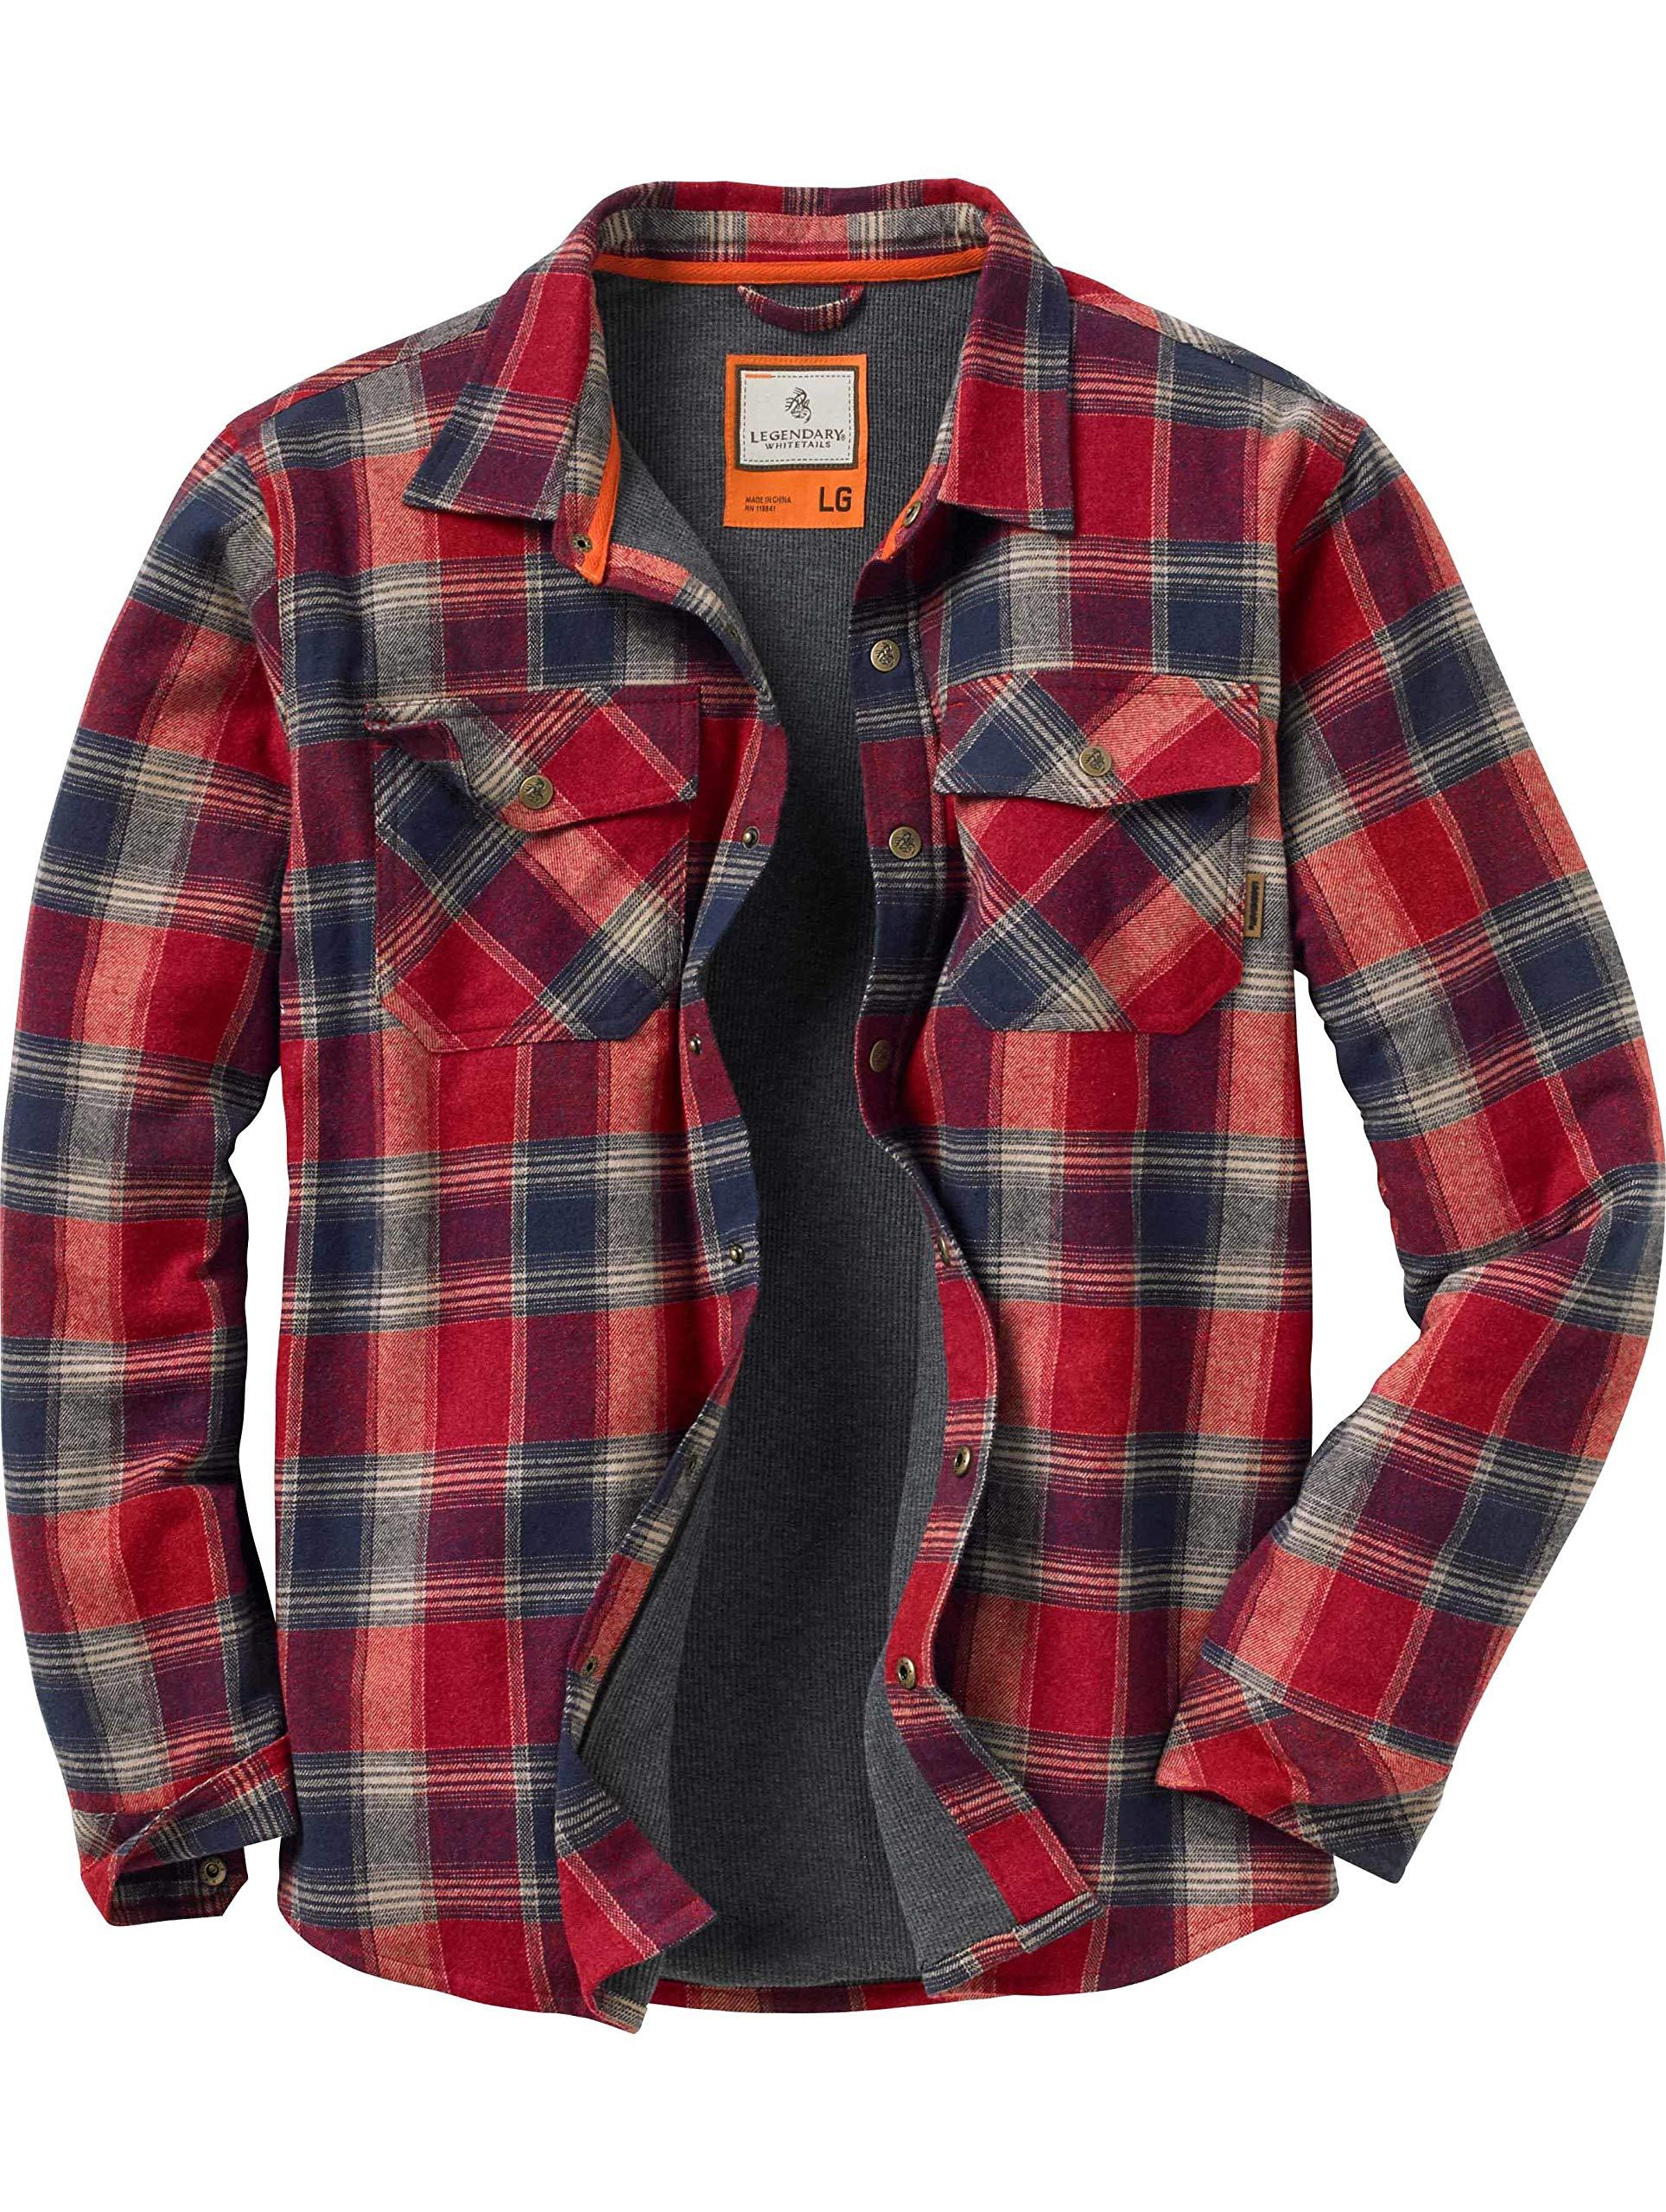 Legendary Whitetails Archer Shirt Jacket, Barnwood Twig Plaid, Medium by Legendary Whitetails